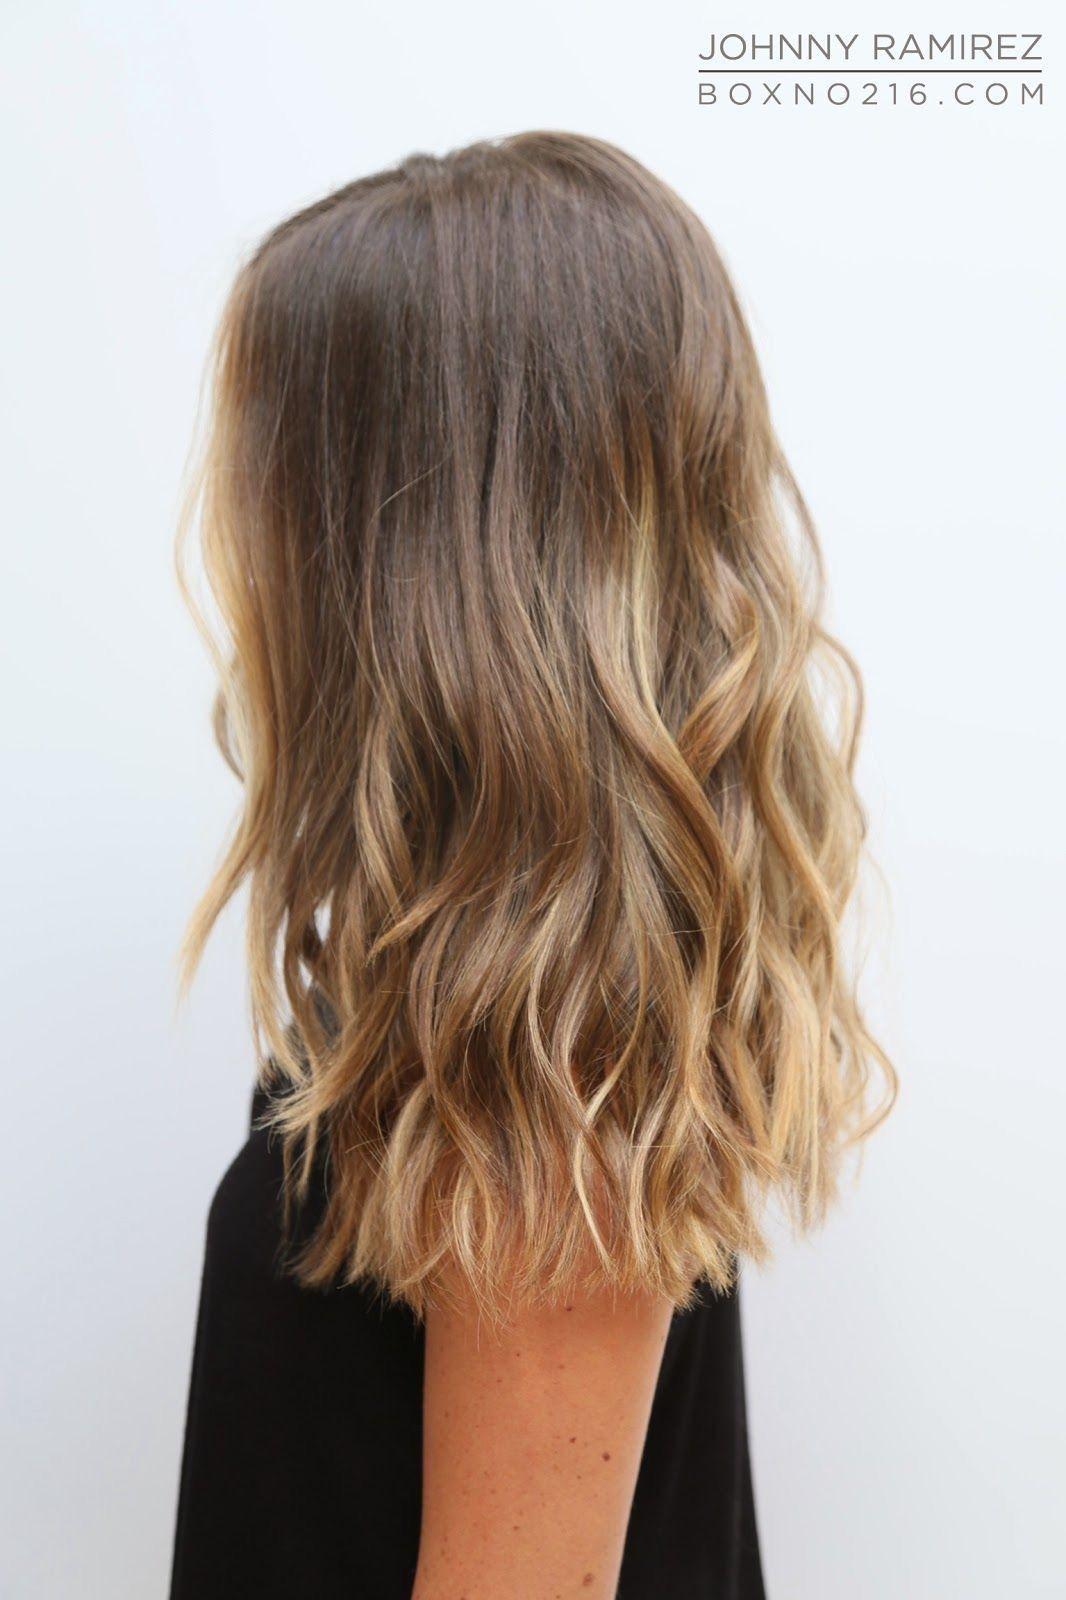 Balayage Hair Loose Curls Waves Hair Hairstyle Medium Hair Medium Hairstyle Hair Lengths Medium Hair Styles Long Hair Styles